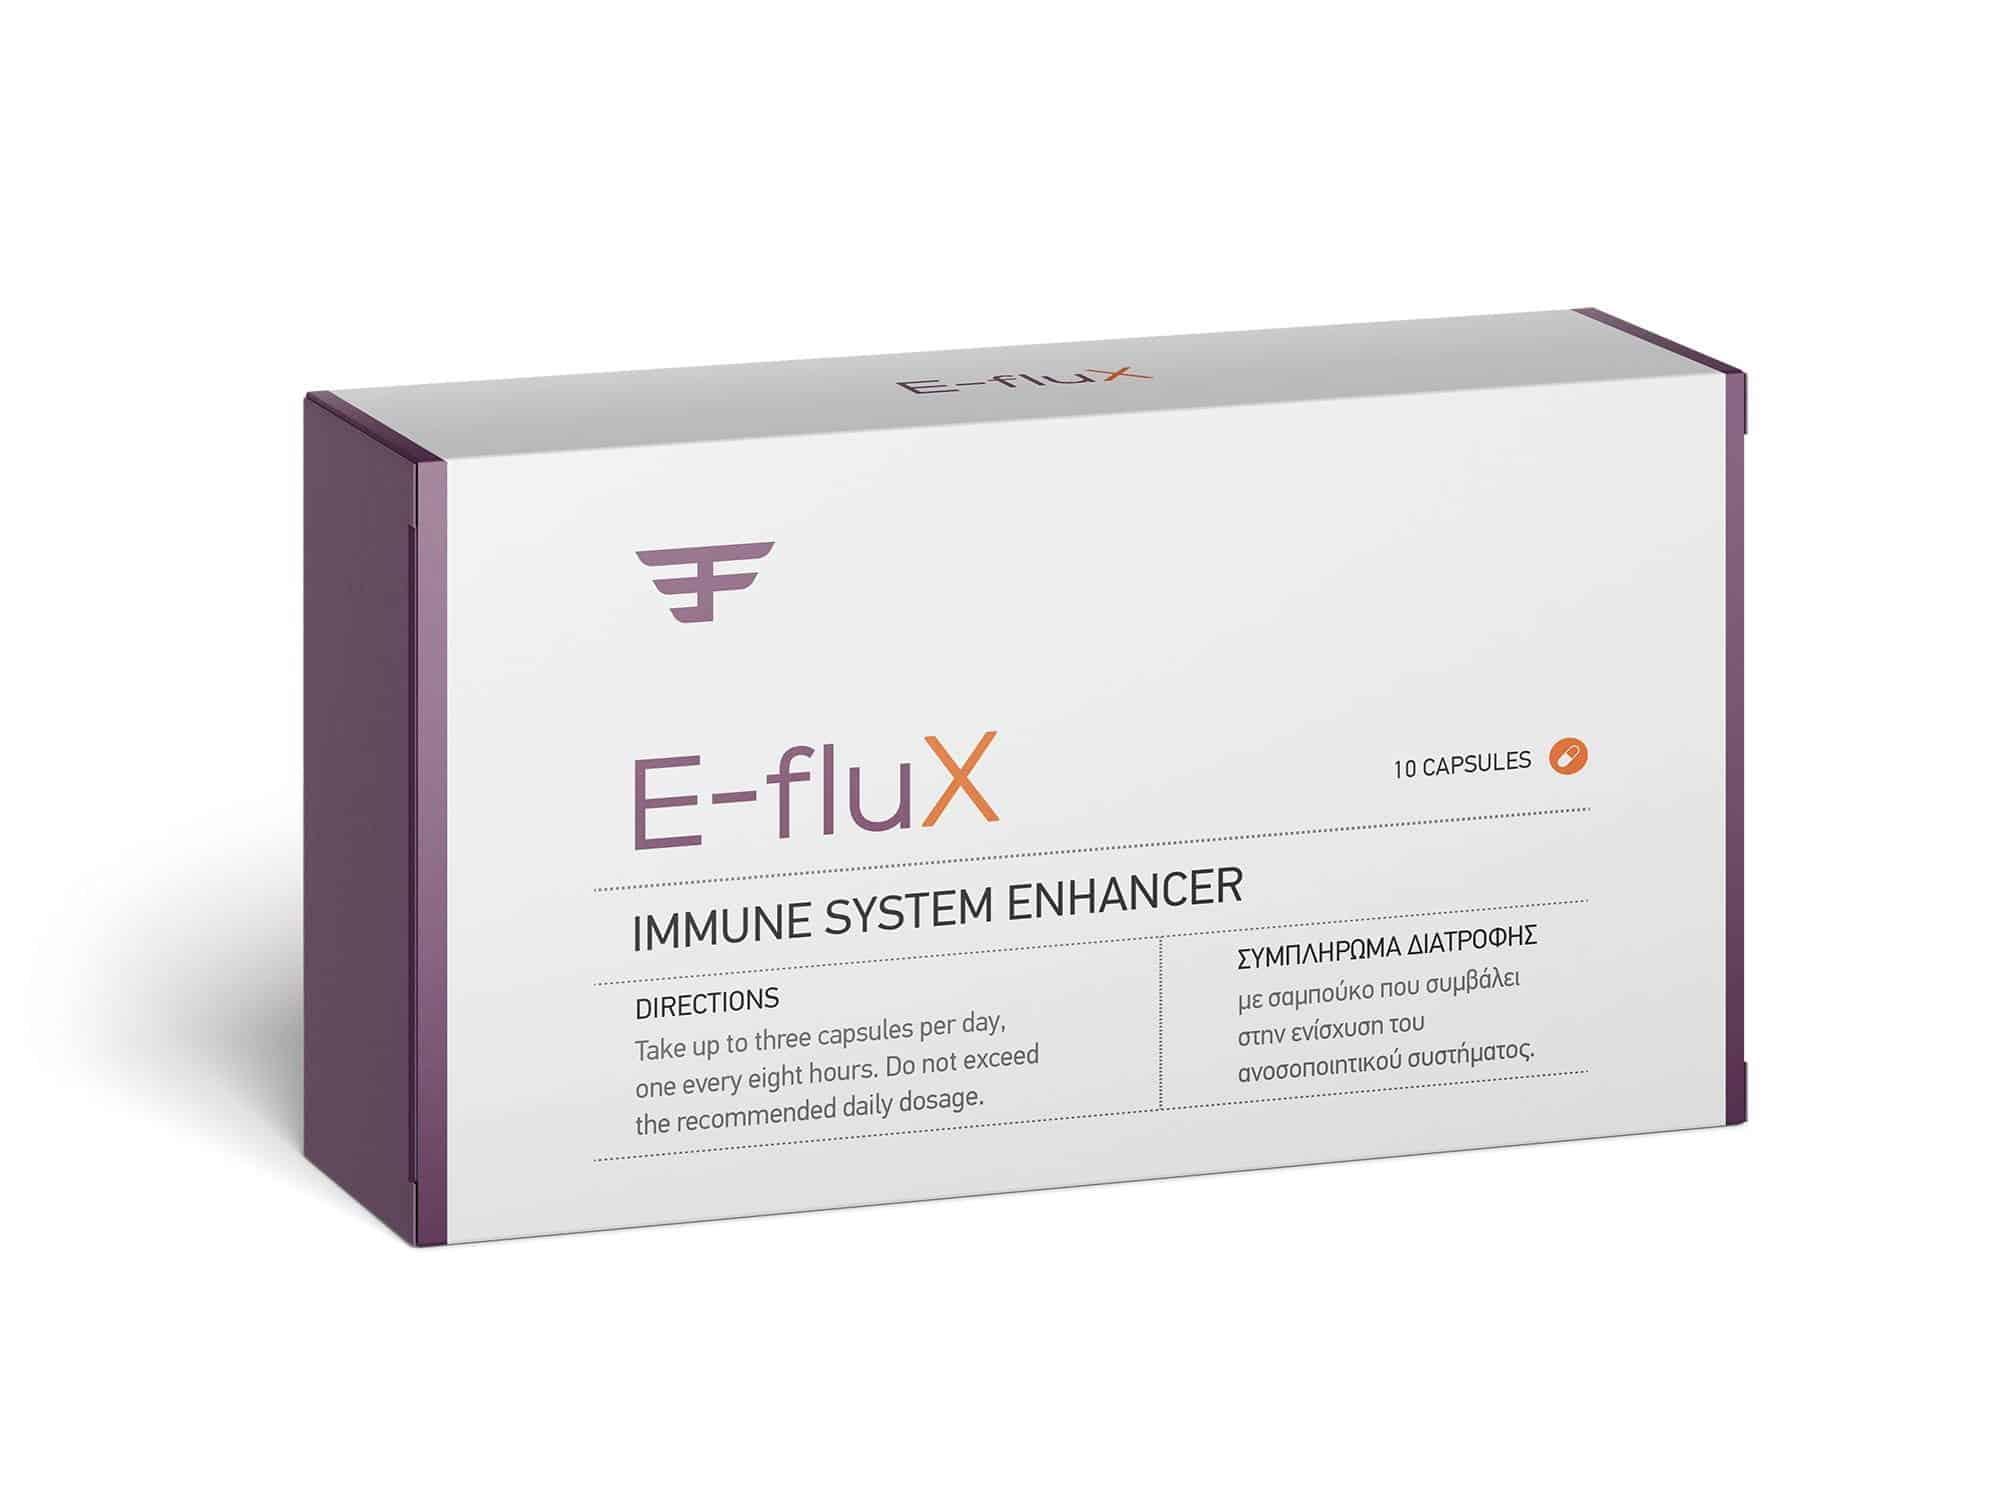 E-fluX: Το συμπλήρωμα διατροφής που προλαμβάνει και προστατεύει από τους ιούς της γρίπης και του κρυολογήματος